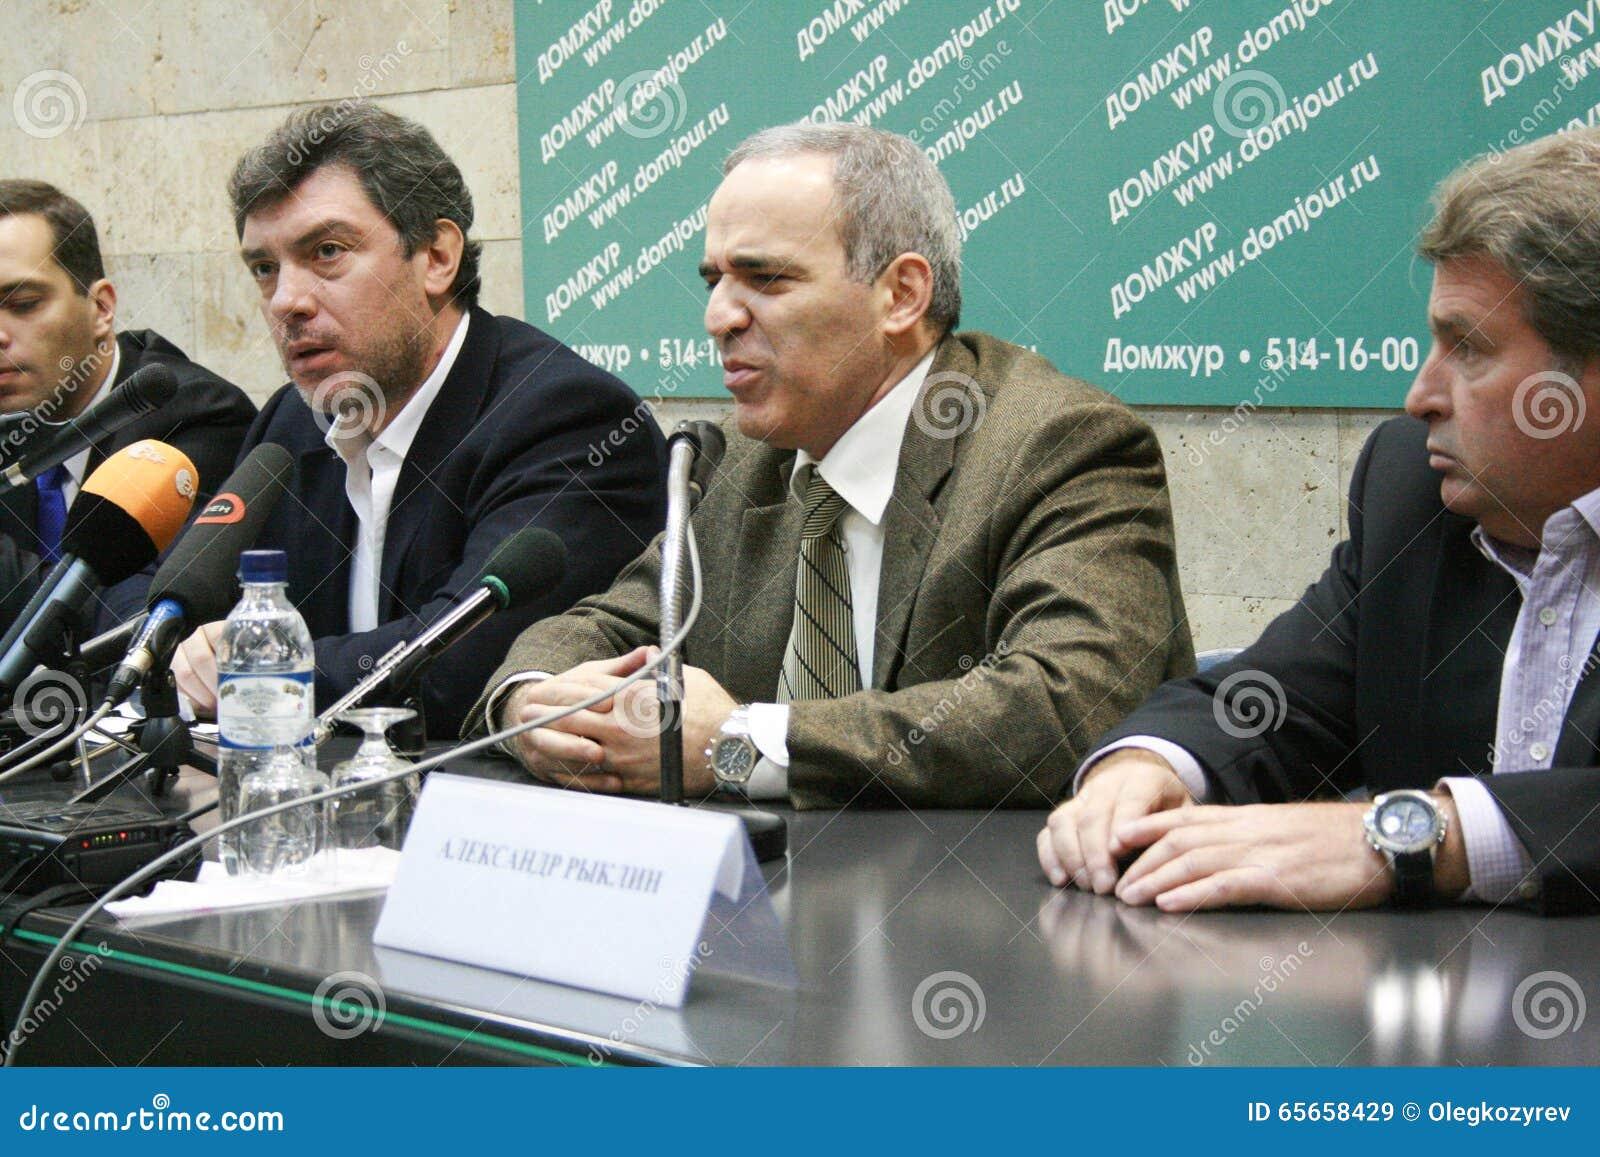 Kasparov politics